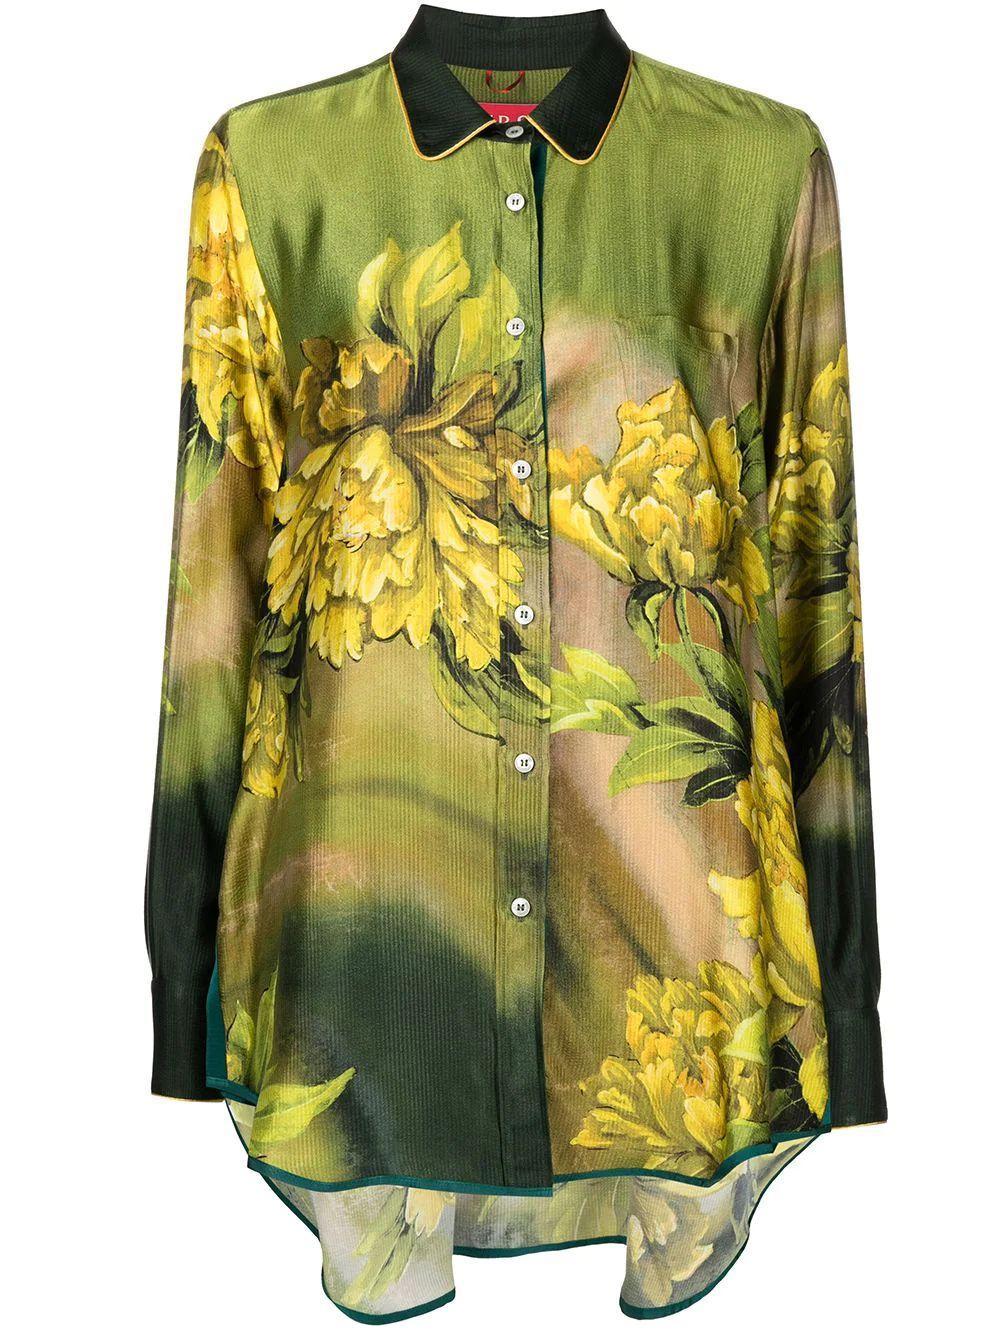 Floral Collared Blouse Item # CA000199-TE00577